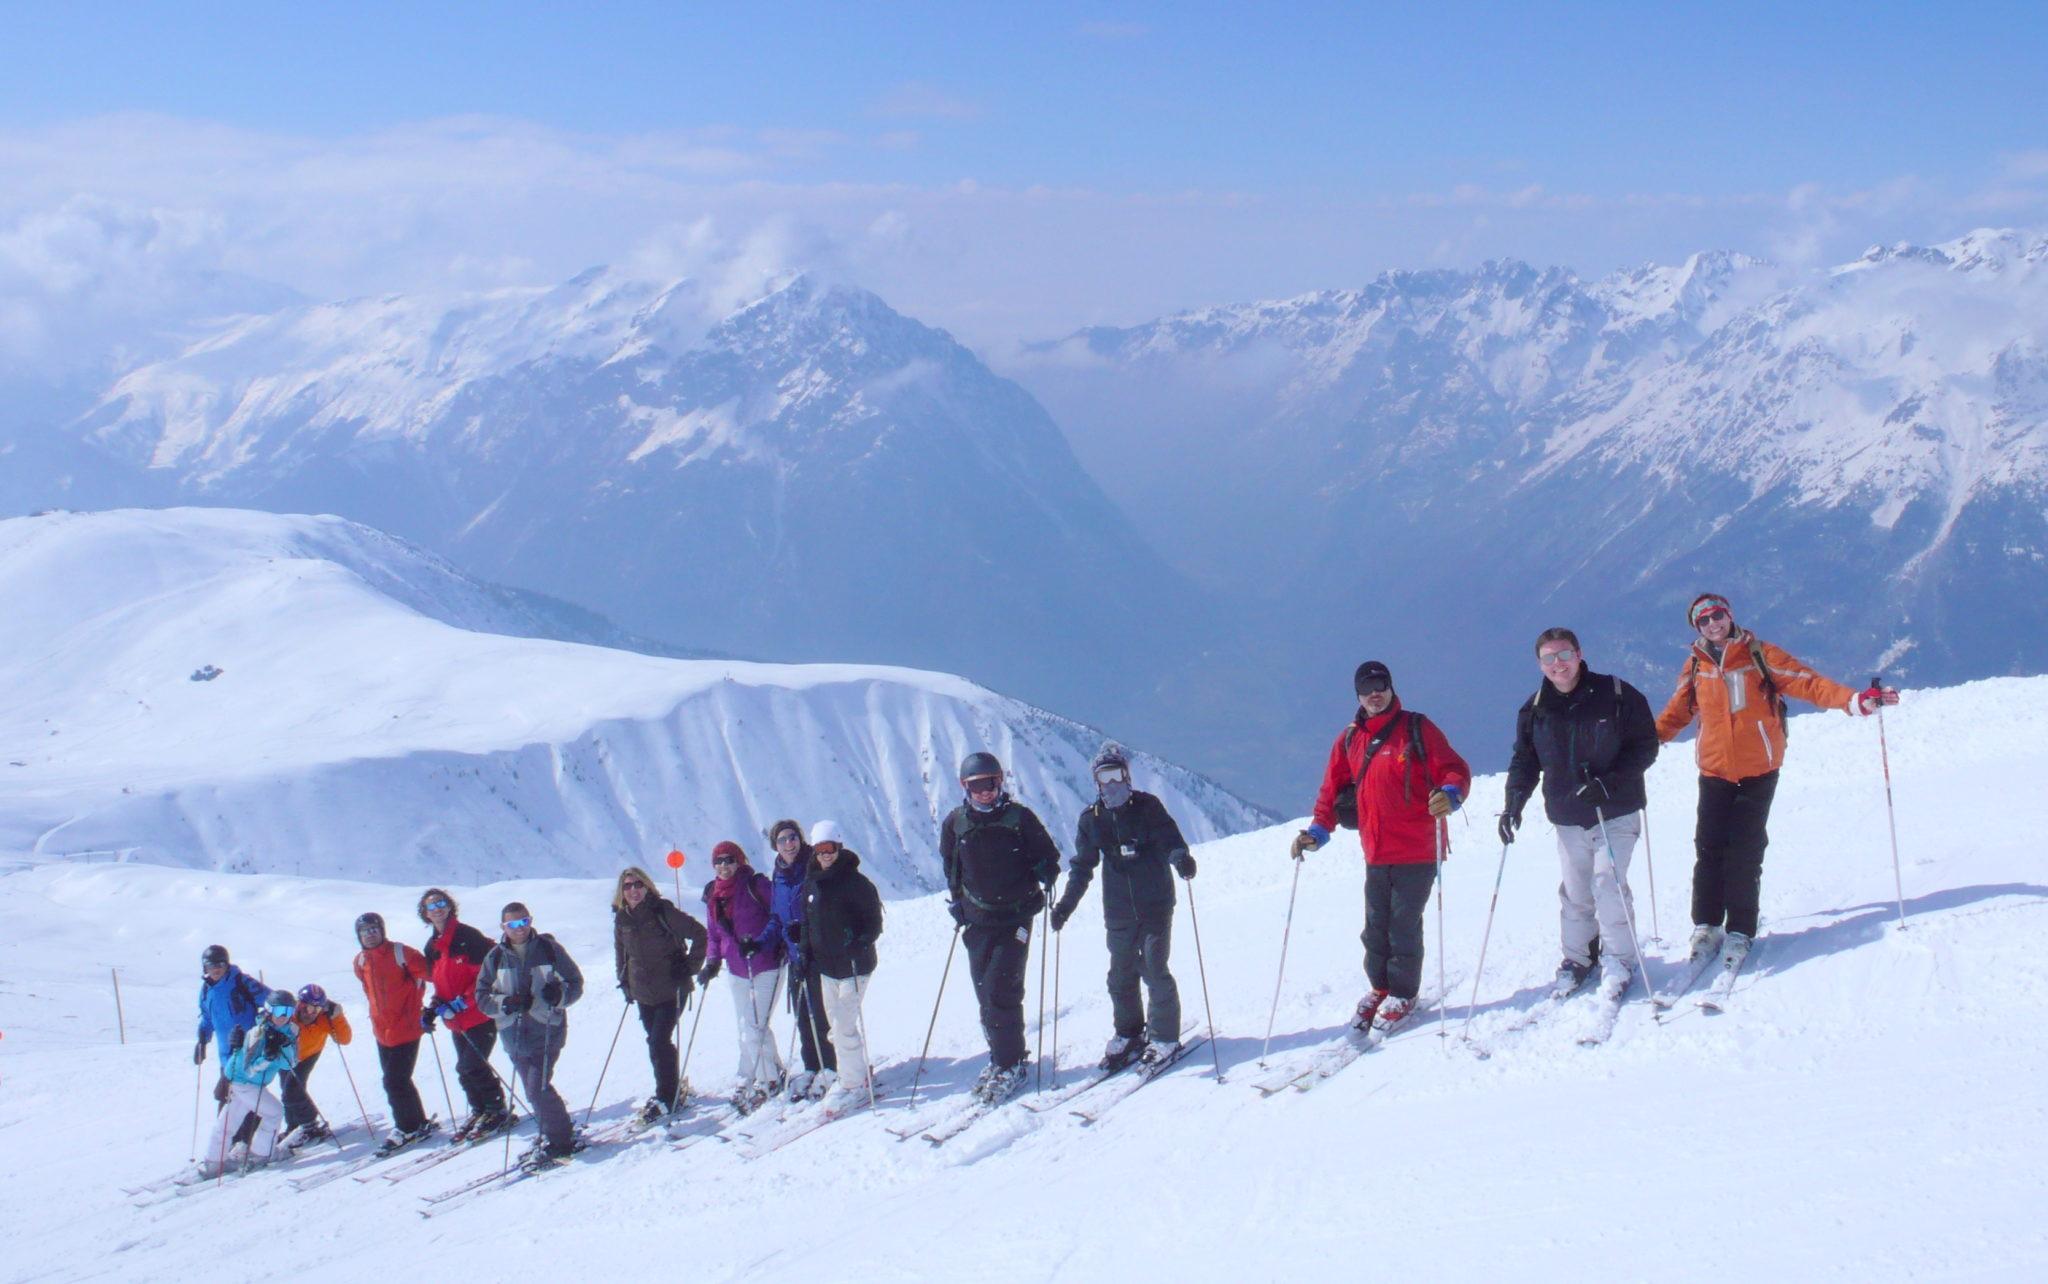 Sortie Ski 18-20 Janvier Alpes D'huez